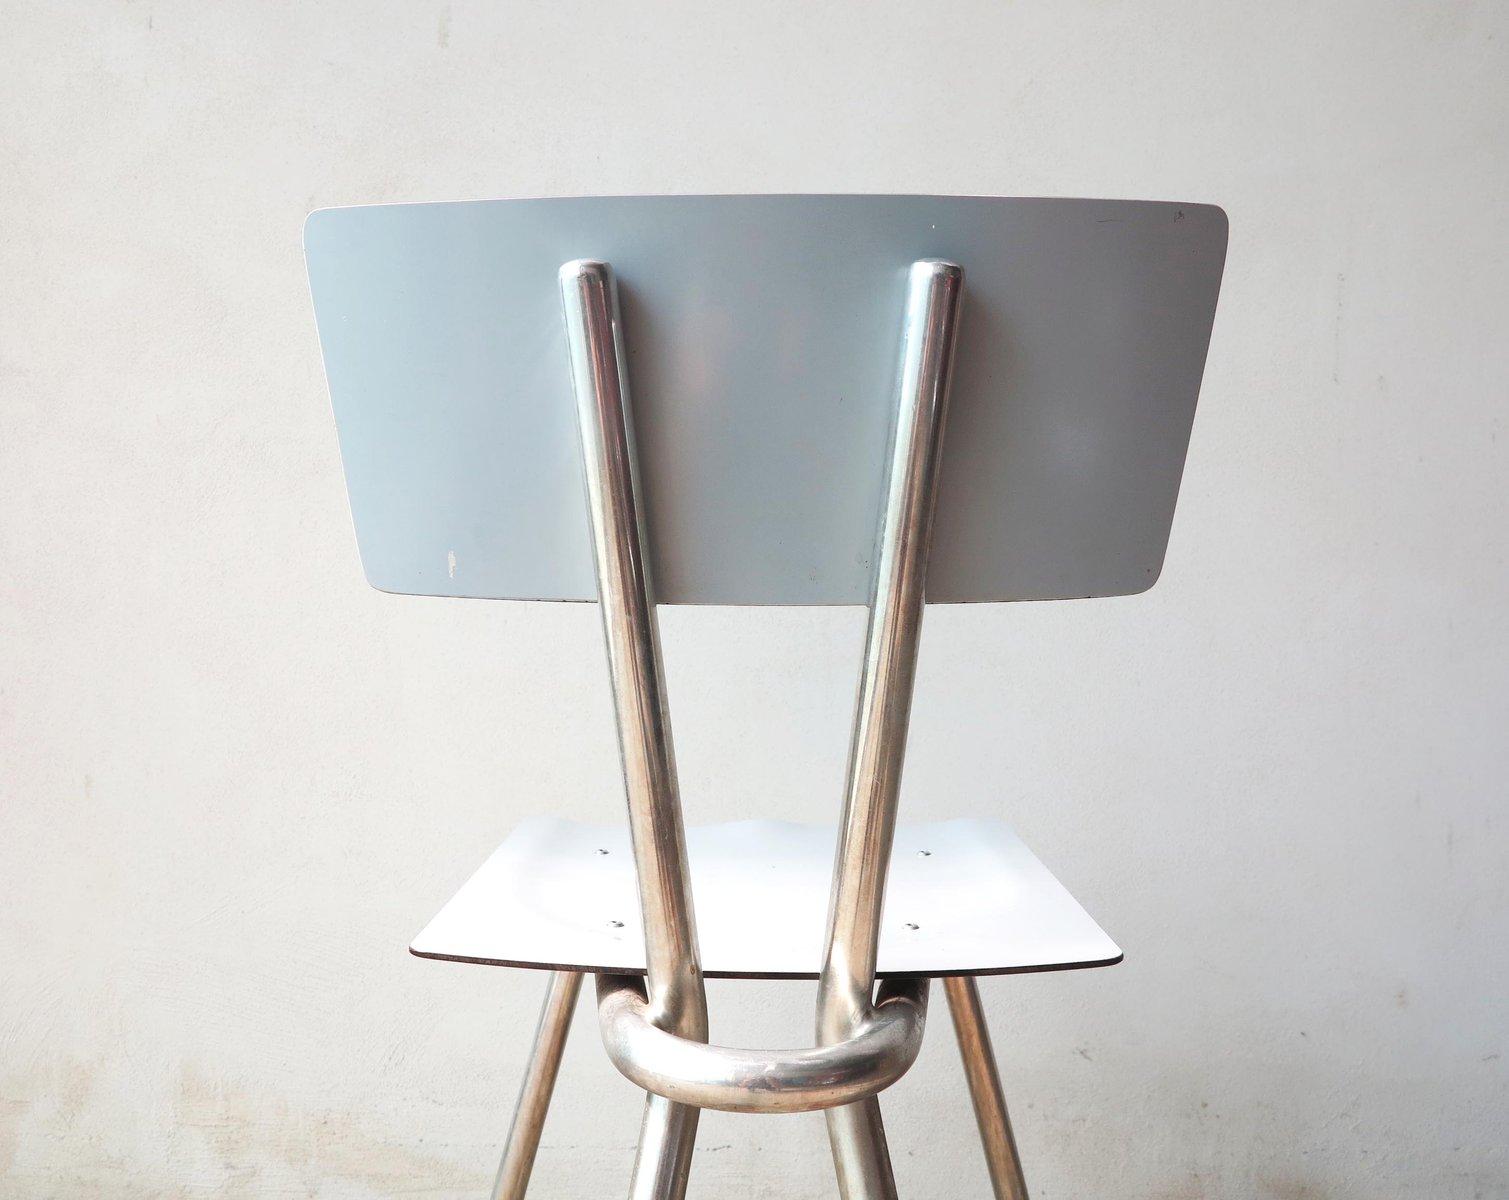 Sedie In Metallo Vintage : Sedie metallo vintage roma sedia vintage in legno imbottita con